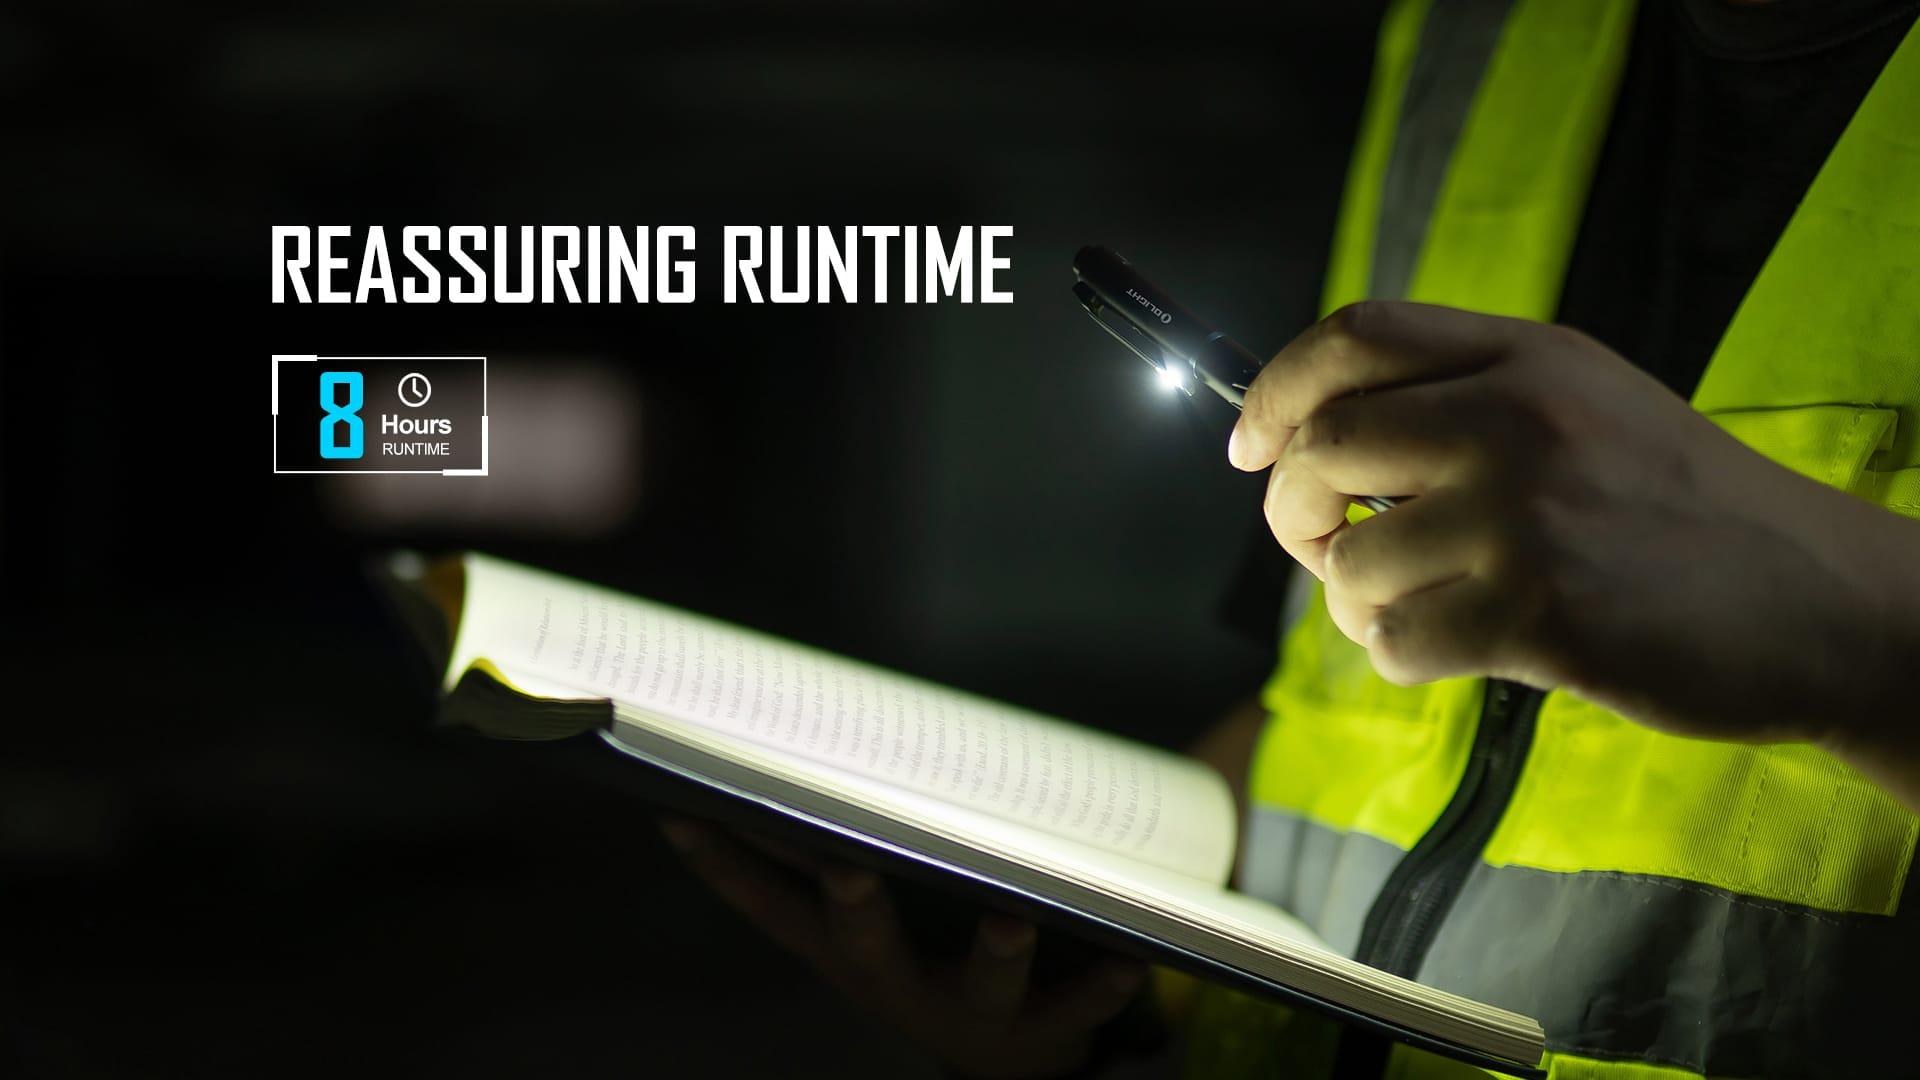 Open Pro Pen Light Reassuring Runtime